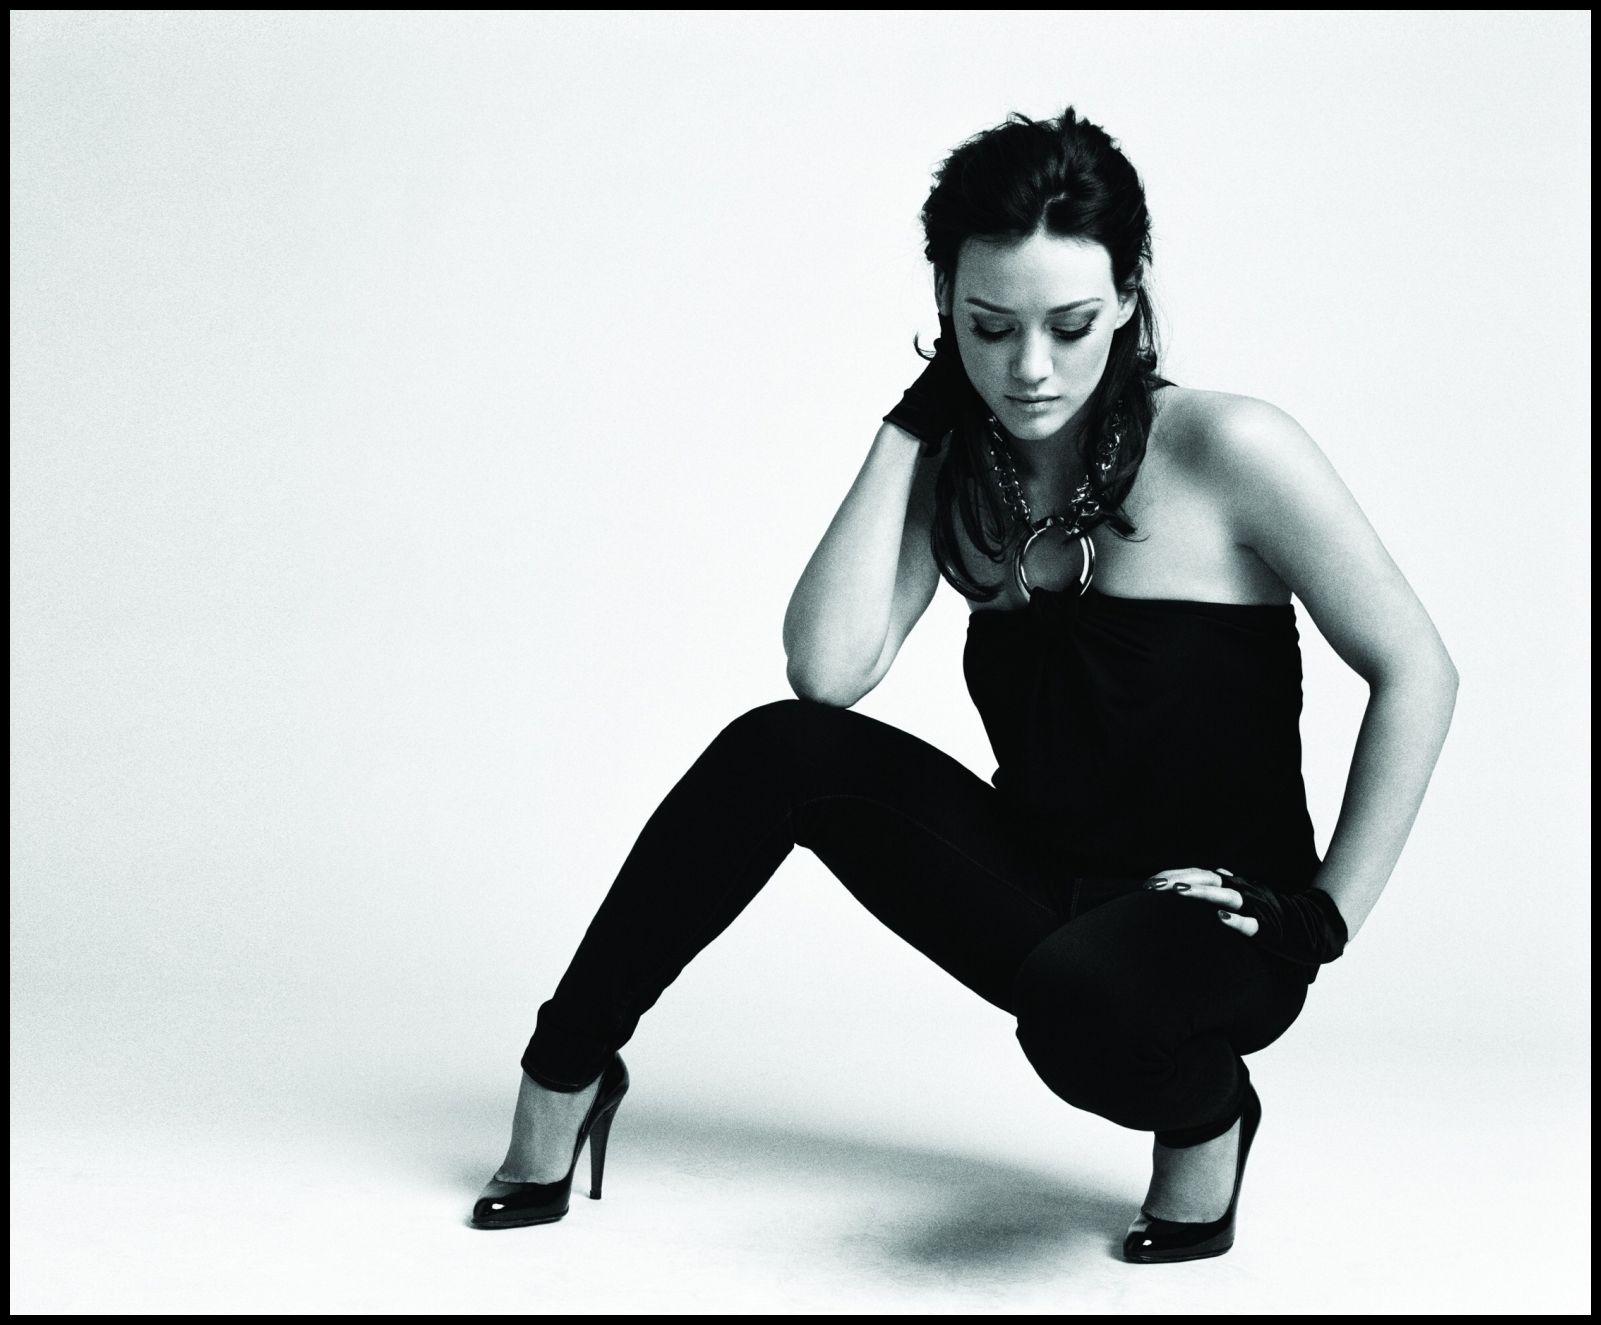 Никки Бенц(Nikki Benz) Порнозвезда Видео, Фото